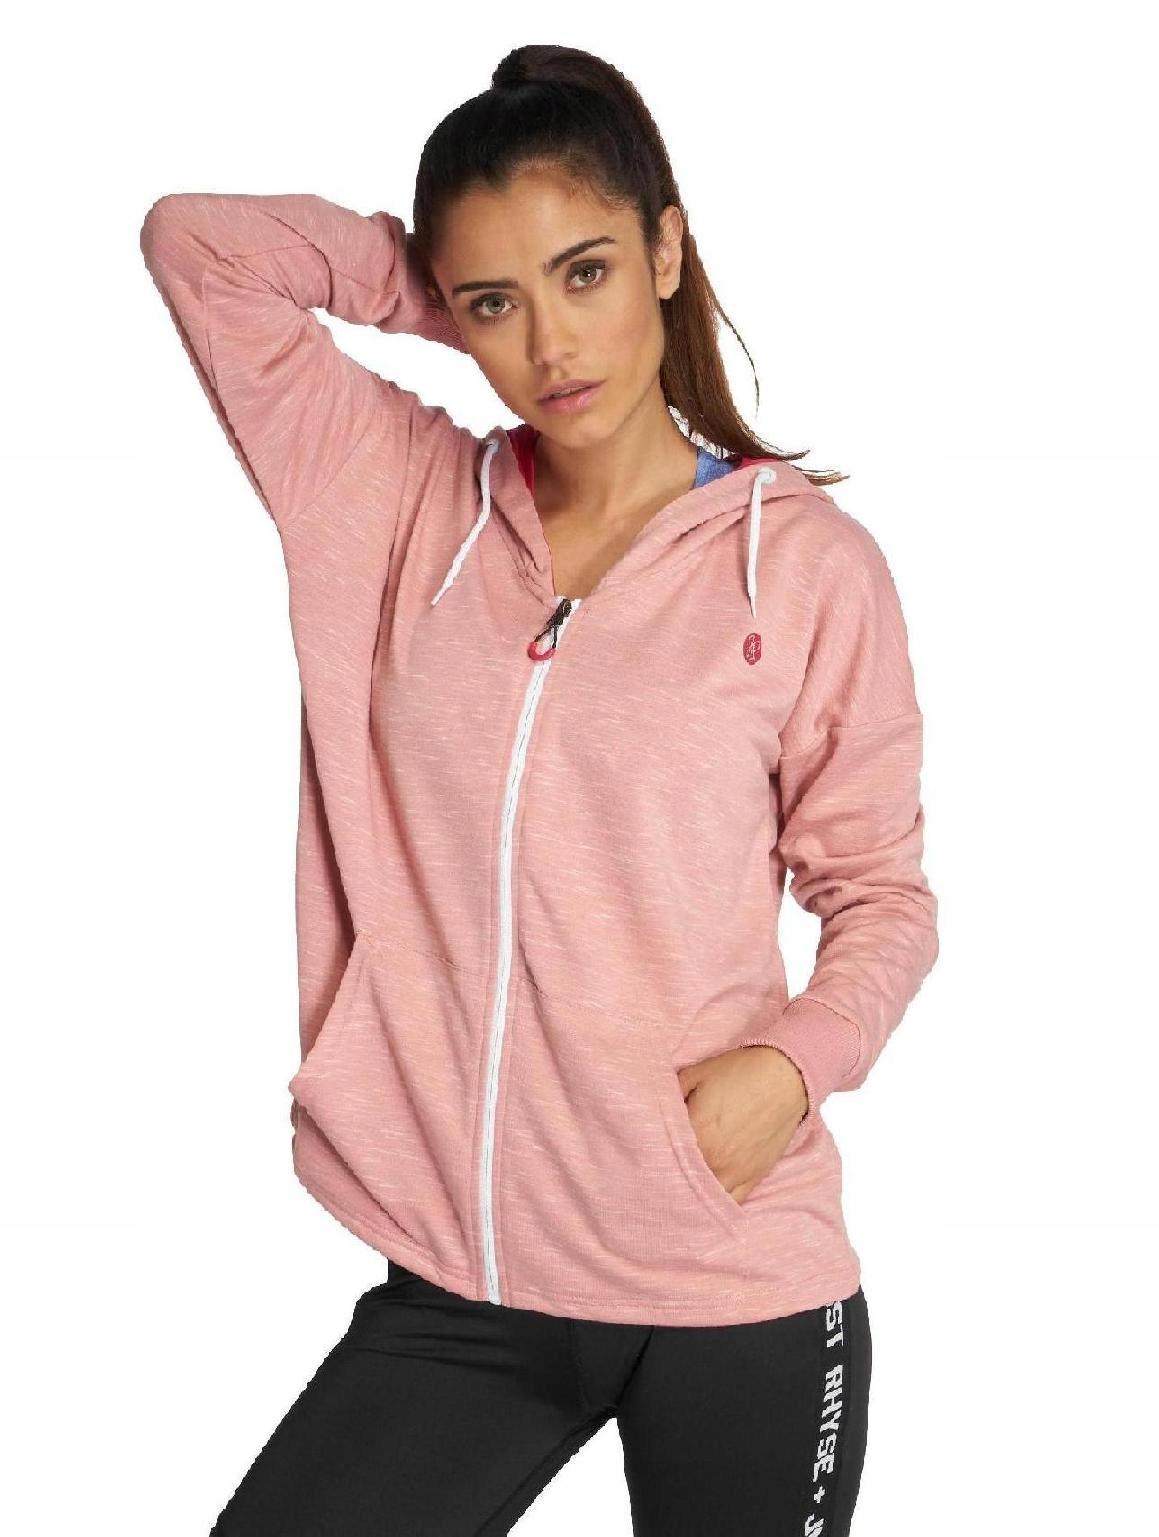 Bluza Zip Just Rhyse Akatore Active różowa M